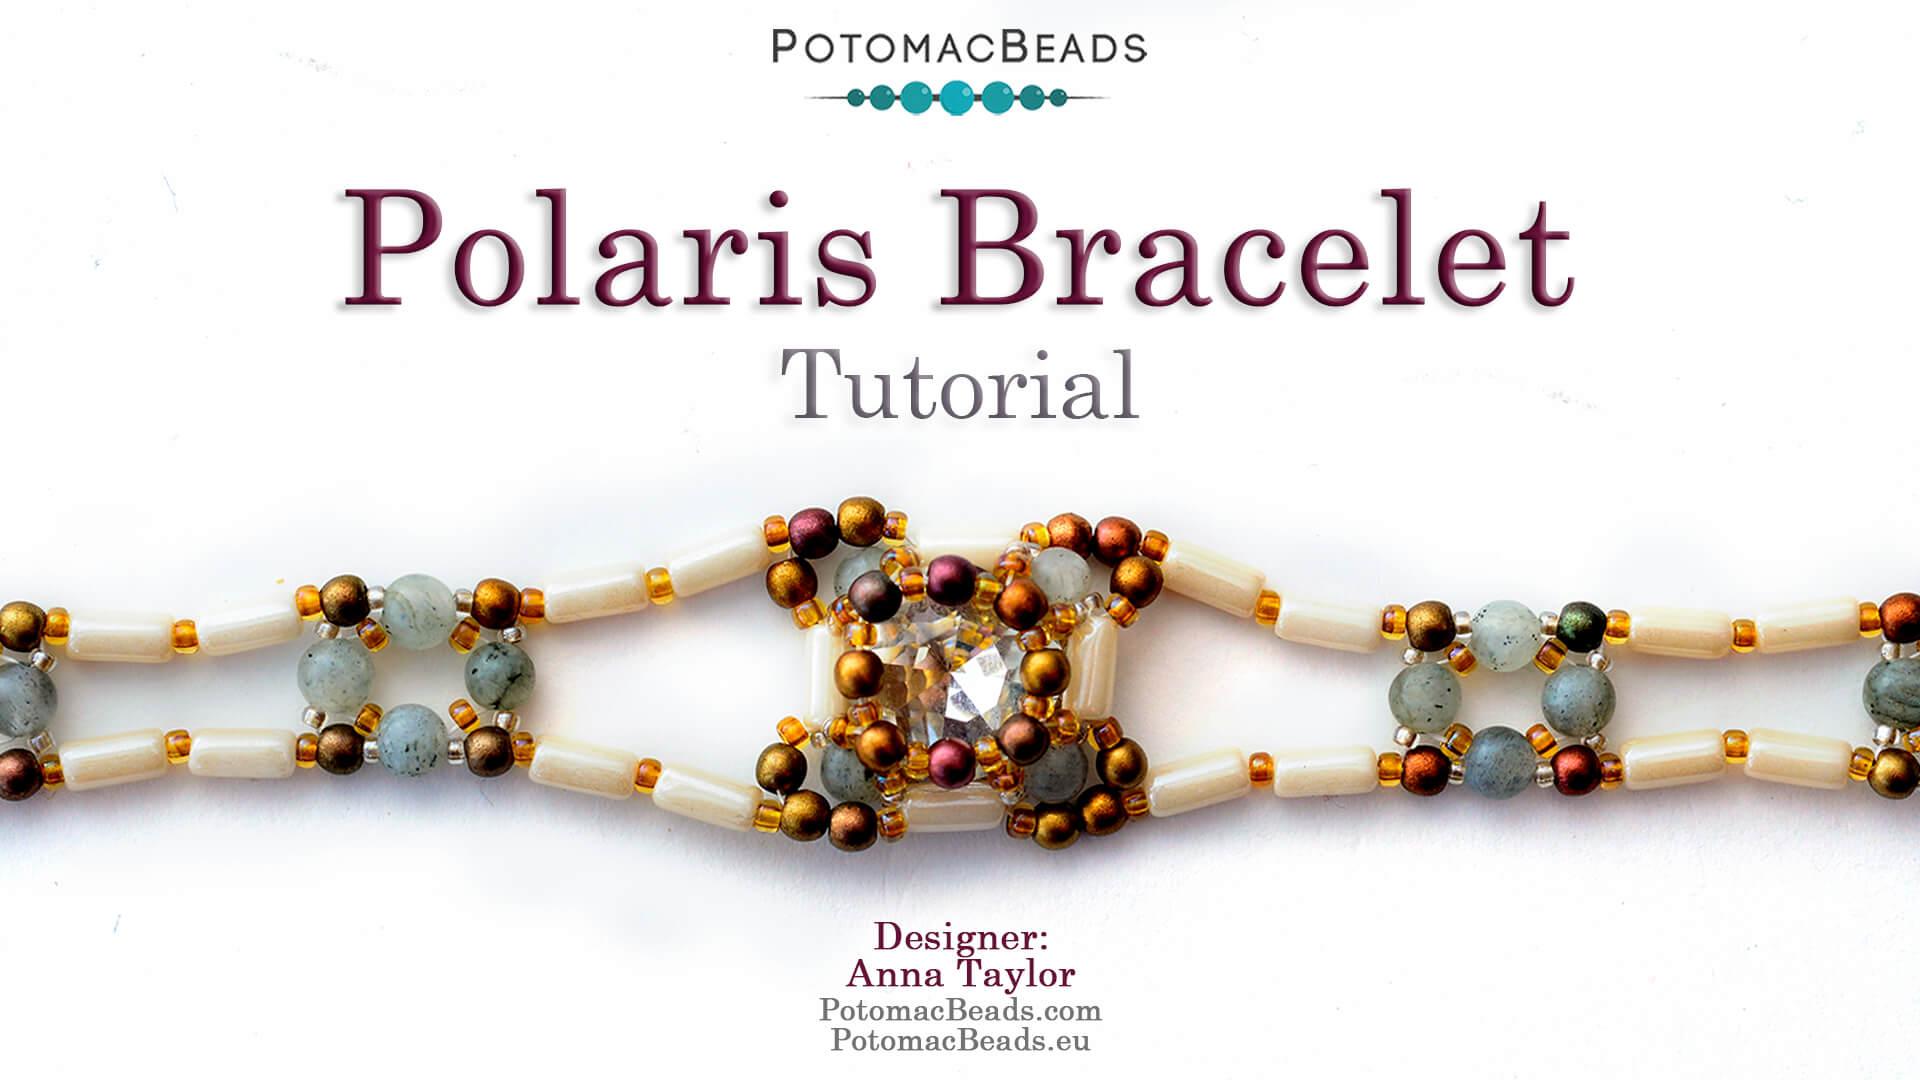 How to Bead Jewelry / Videos Sorted by Beads / Gemstone Videos / Polaris Bracelet Tutorial